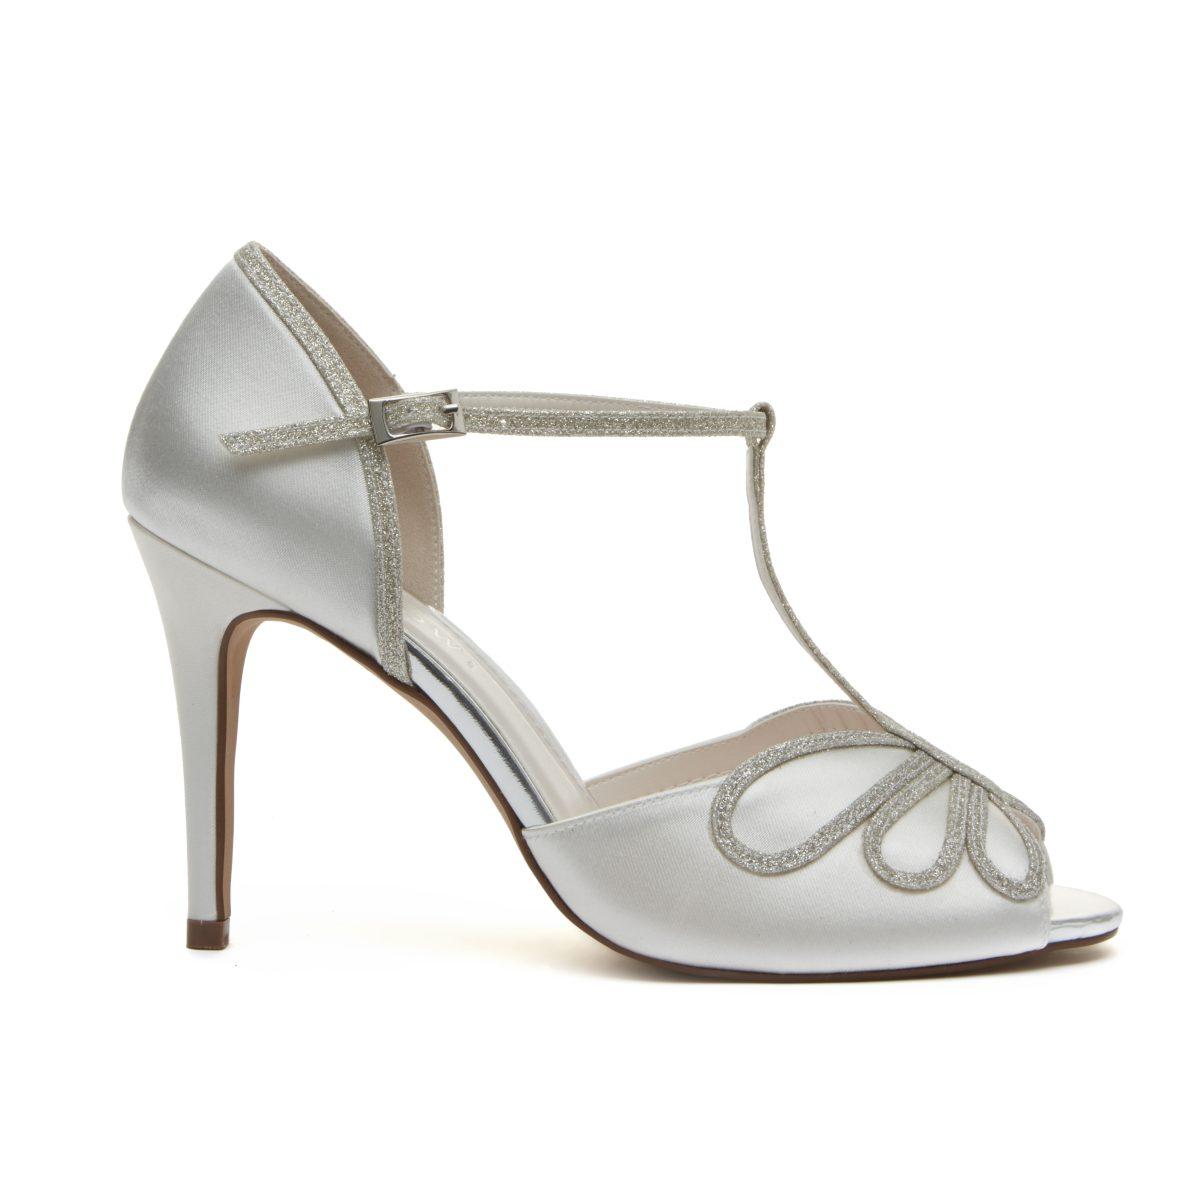 Rainbow Club Luciana - Peep Toe Satin/ Silver Shimmer Shoe 2